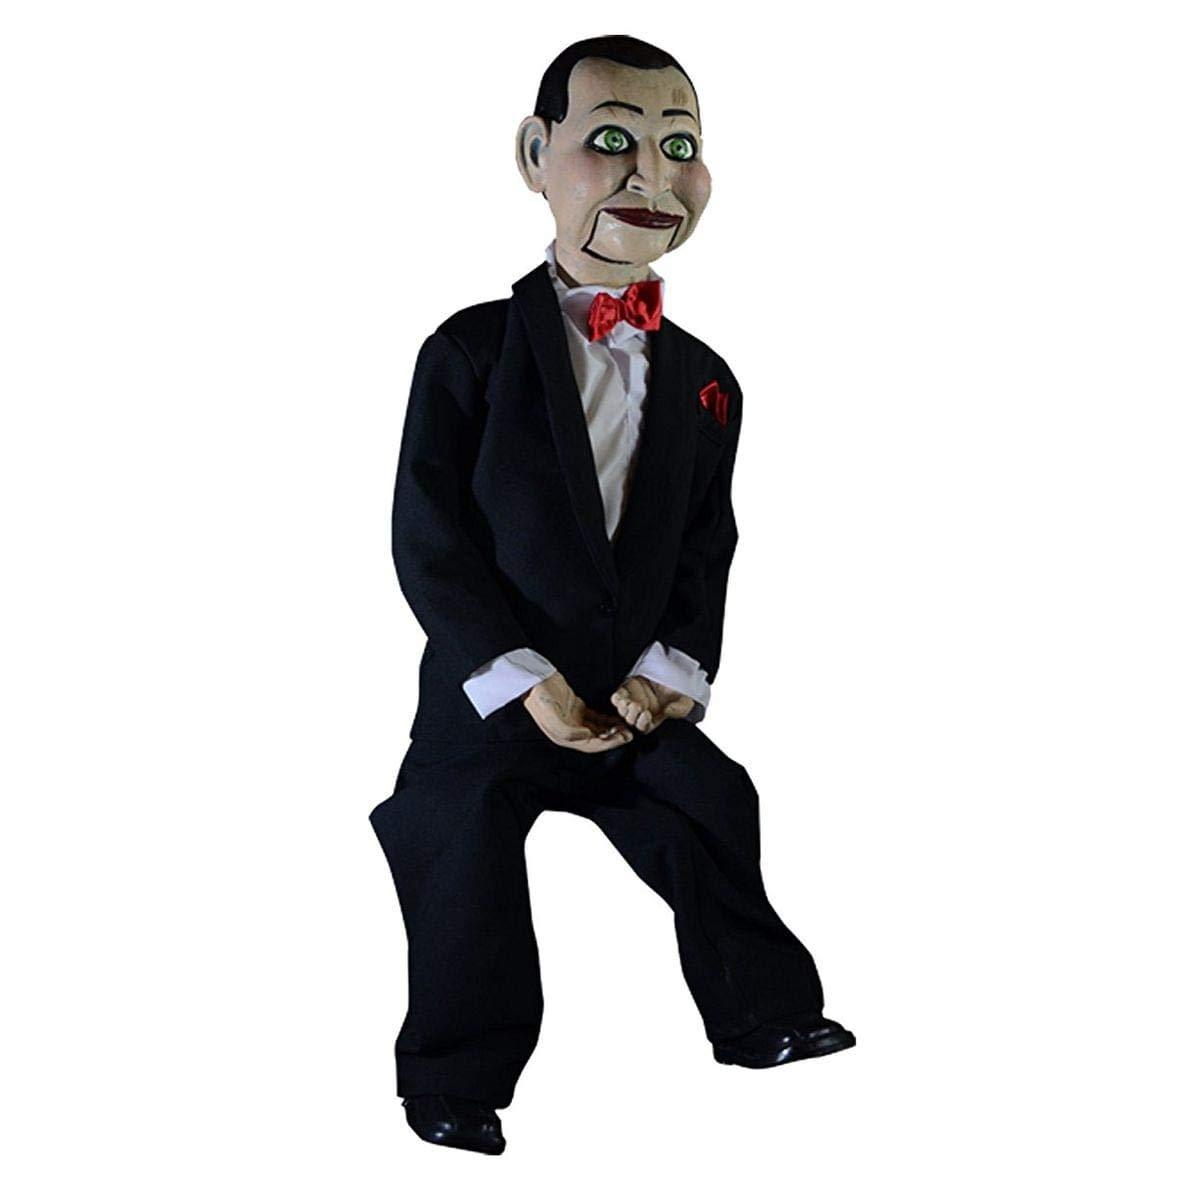 Trick of Treat Studios Studios 死者の沈黙は Trick、ビリー人形の小道具を見ました of B075V1YW83, 新品同様:924f45db --- sharoshka.org